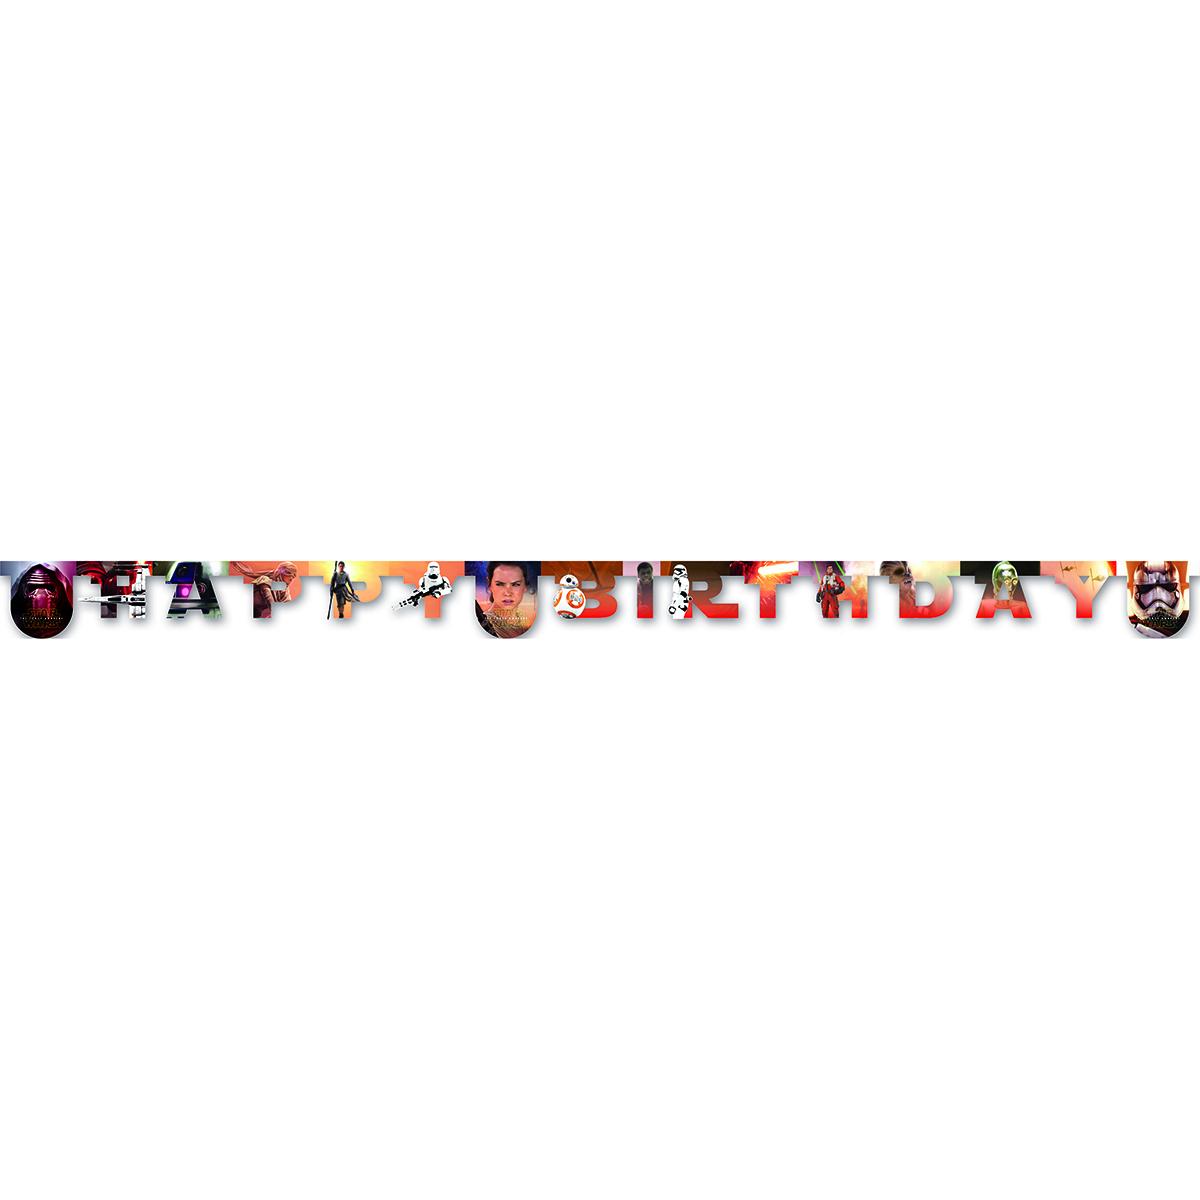 Procos Гирлянда-буквы Happy Birthday Звездные войны гирлянды procos гирлянда самолеты 9 флажков